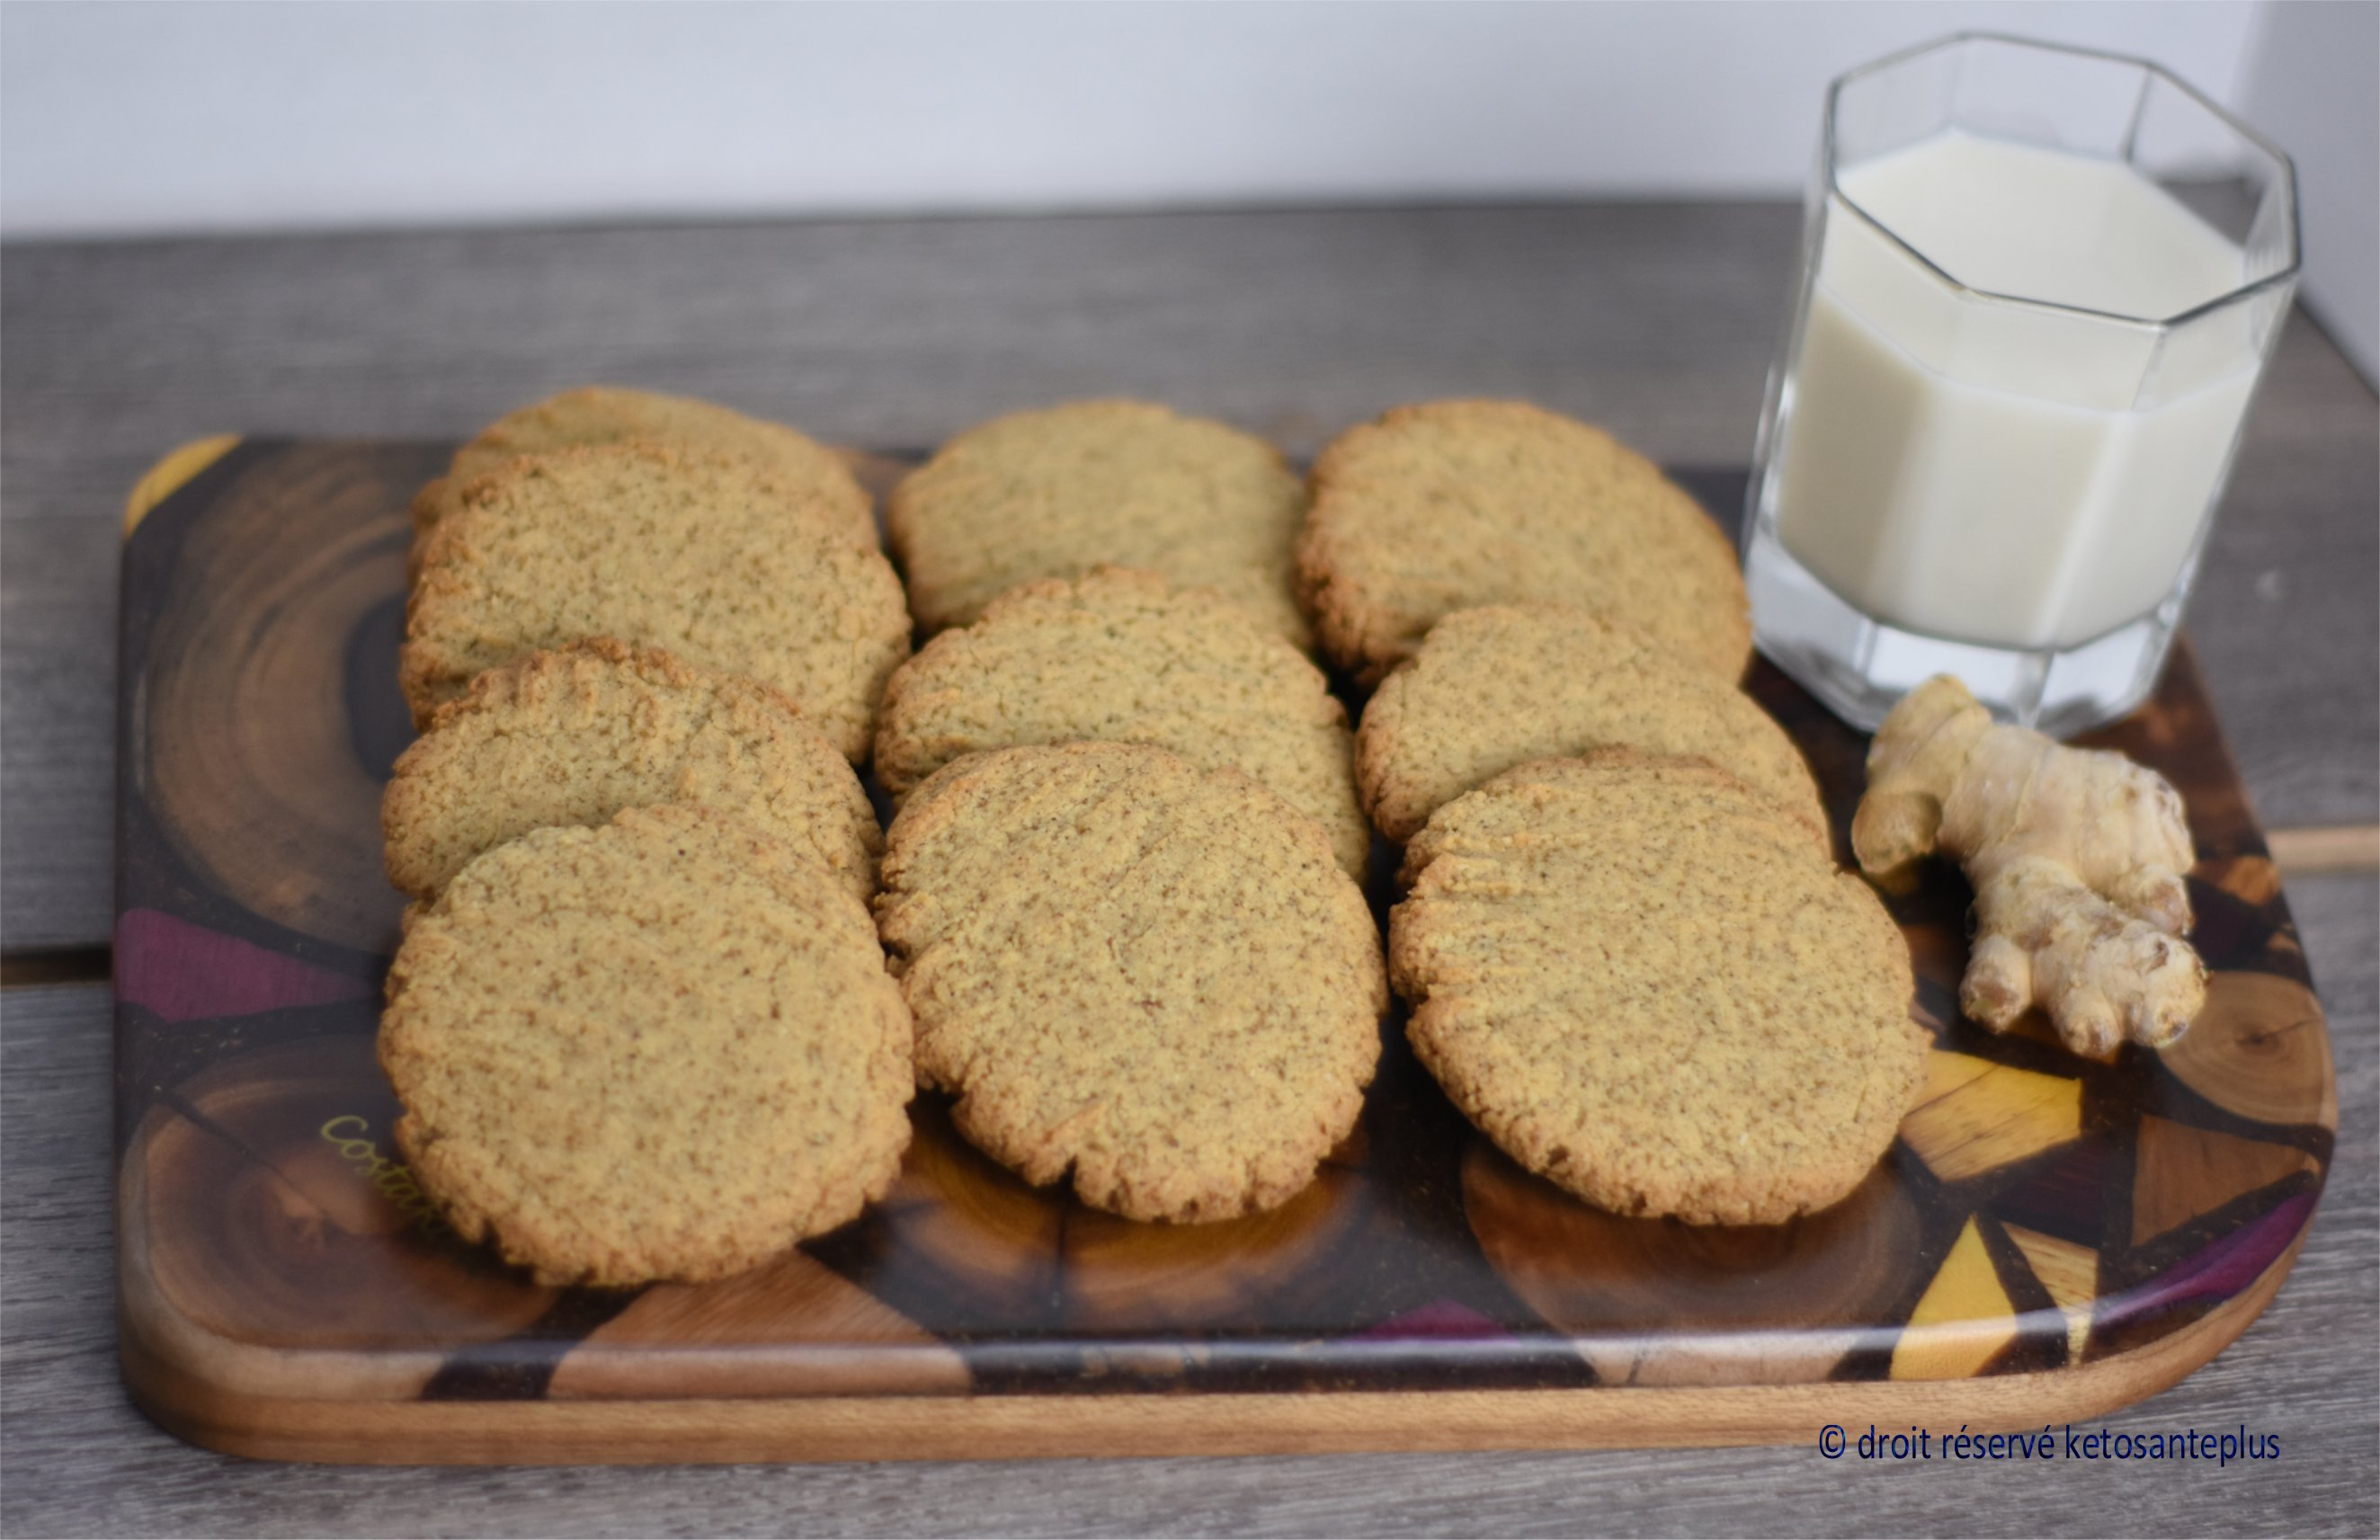 Biscuits au gingembre keto